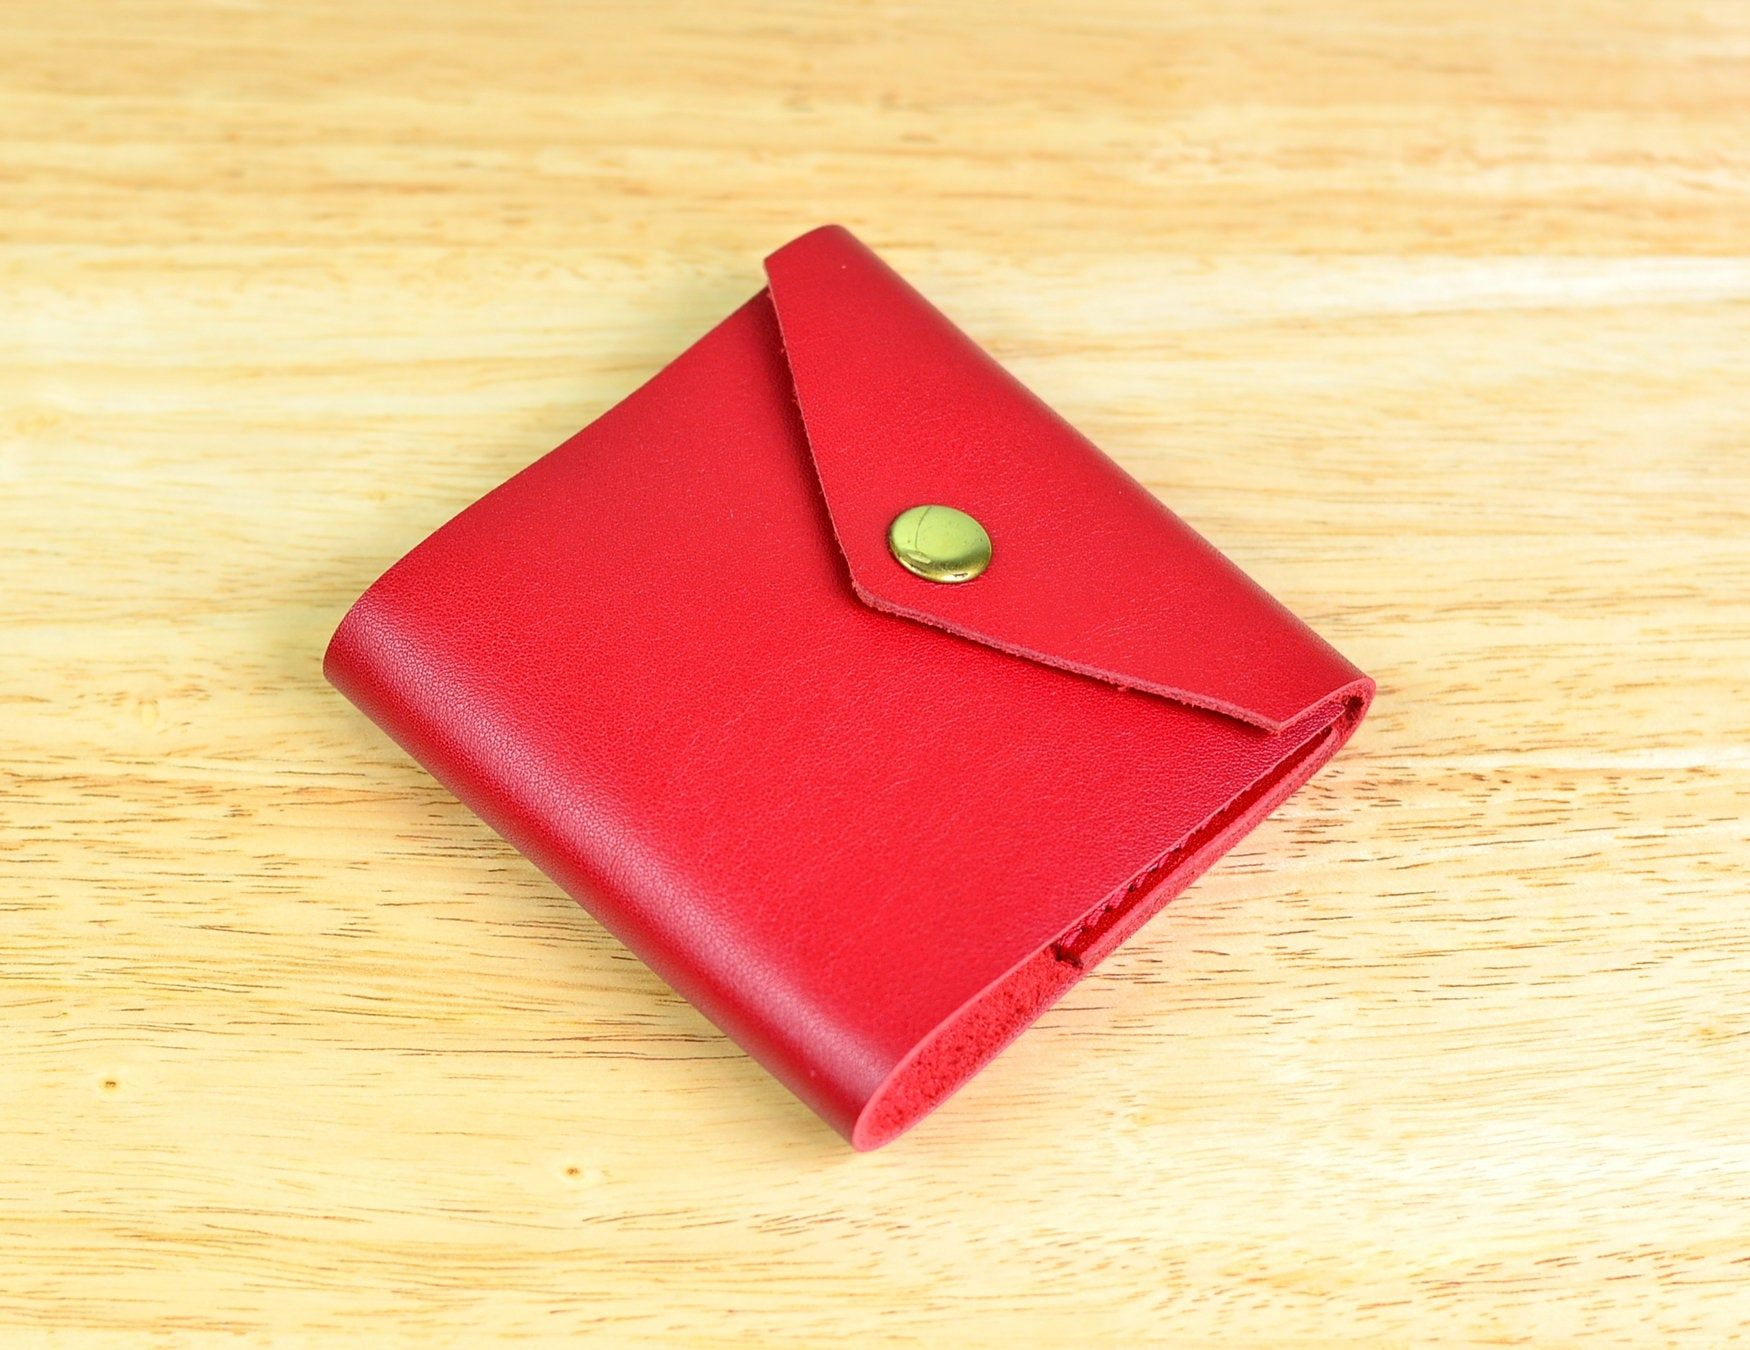 Leather Sticky Notes Cover, Leather Sticky Notes Holder